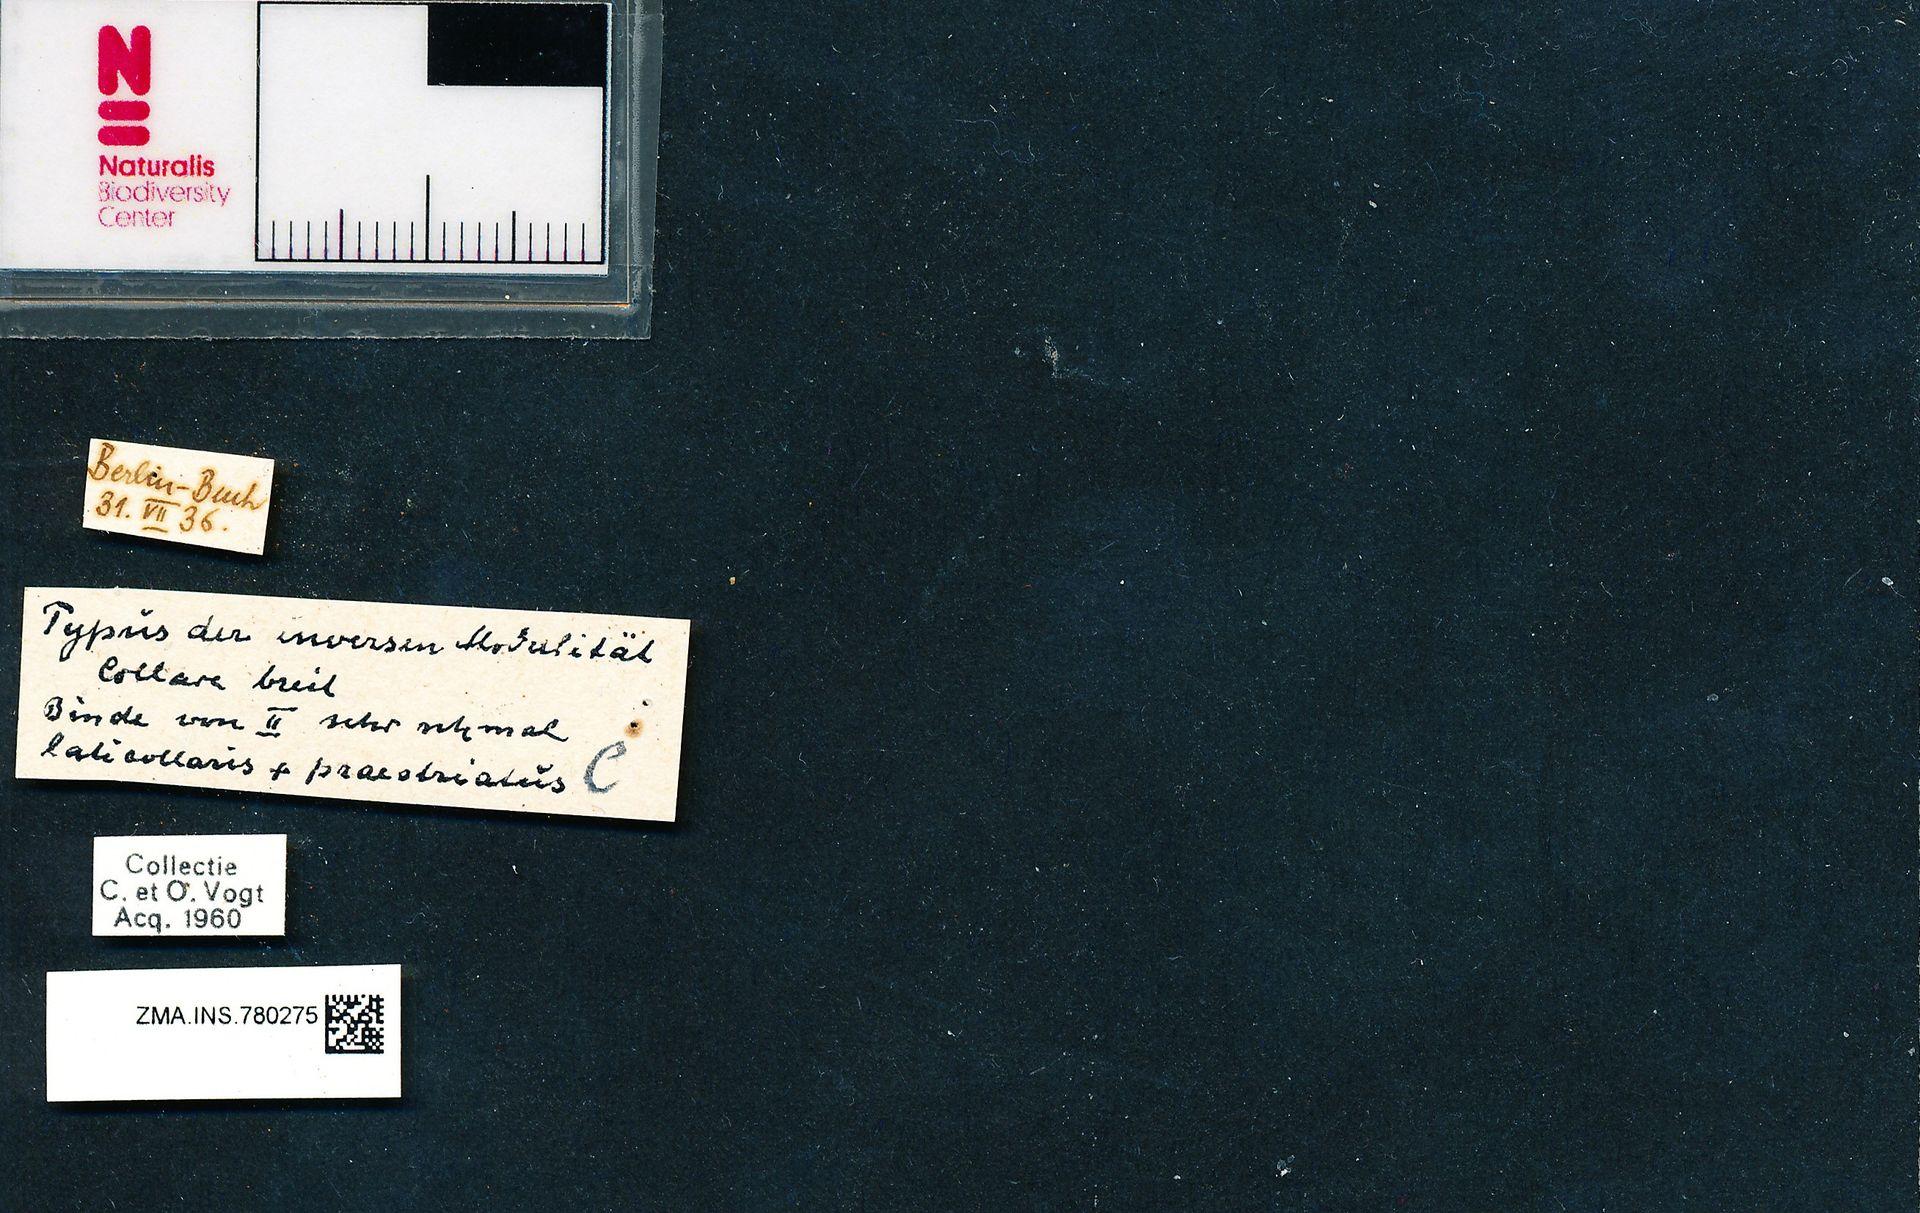 ZMA.INS.780275 | Bombus (Bombus) terrestris terrestris Krüger? i.l.